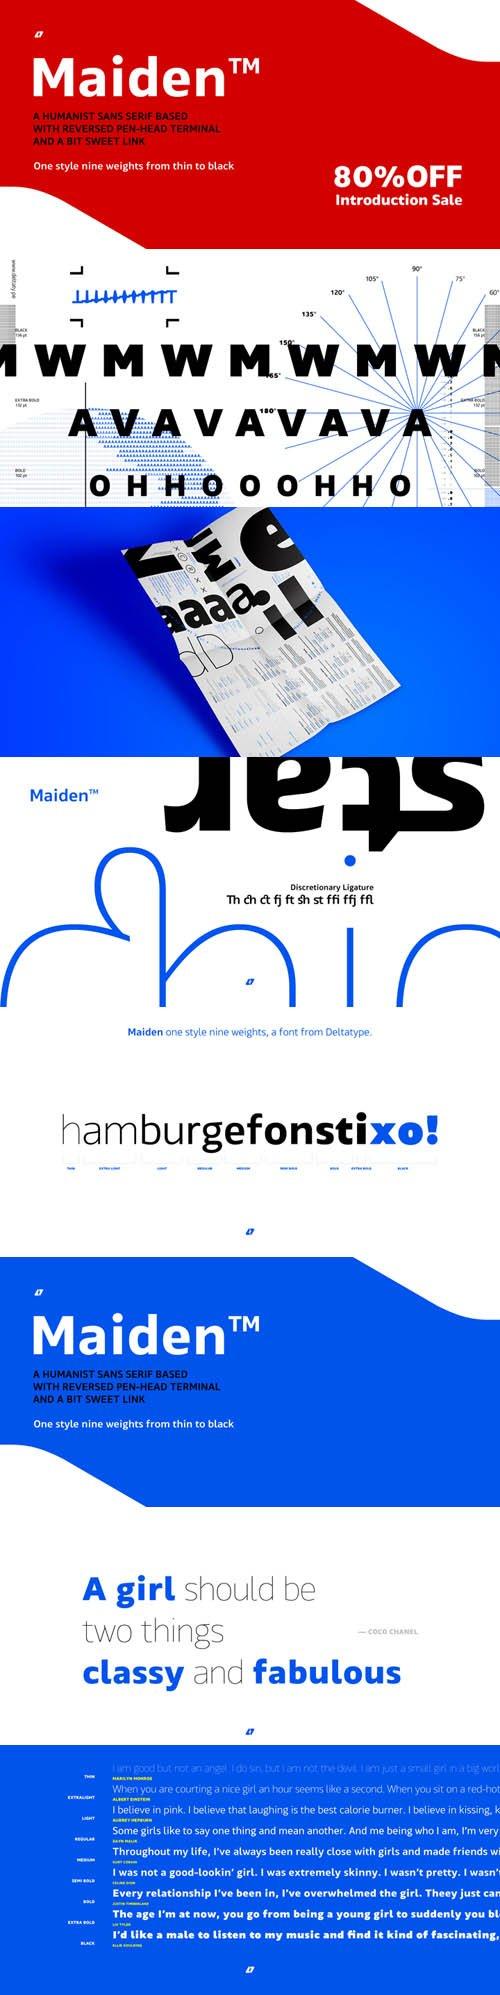 Maiden Sans font family